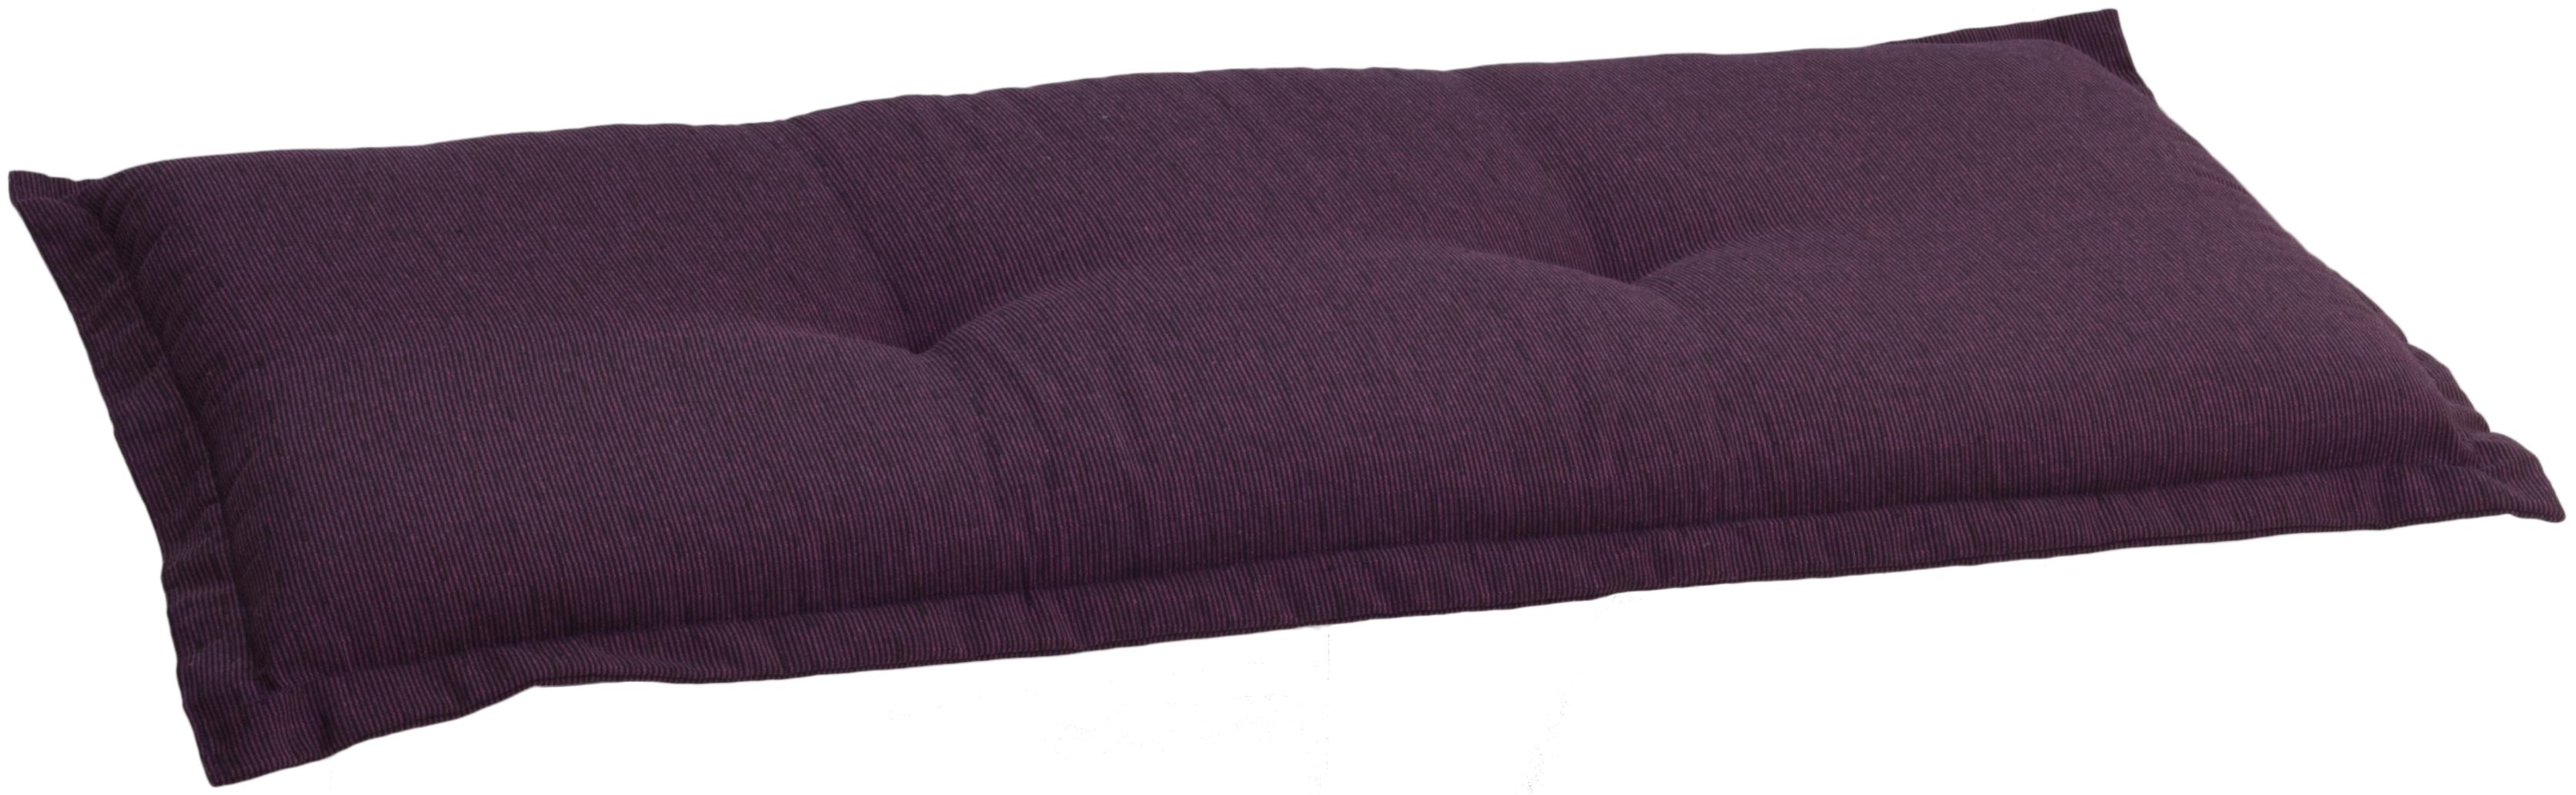 Polster für 2-Sitzer Gartenbank in lila ca. 100 x 45 cm ca.7 cm dick